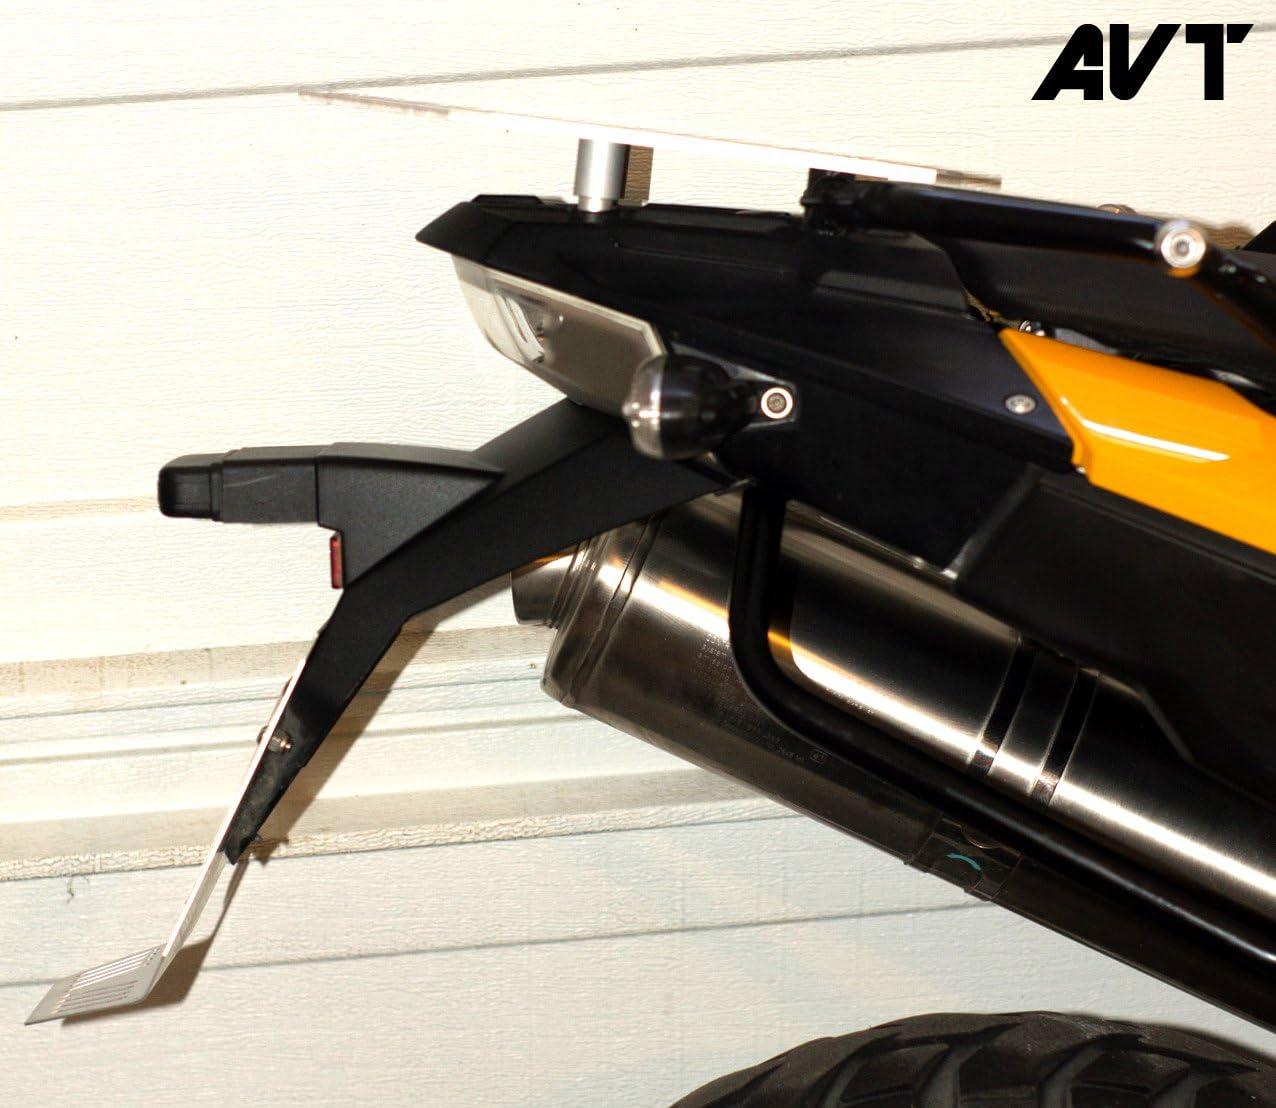 F700GS F800GS Rear Fender Extender//Mud Flap BLACK AVT F650GS Twin